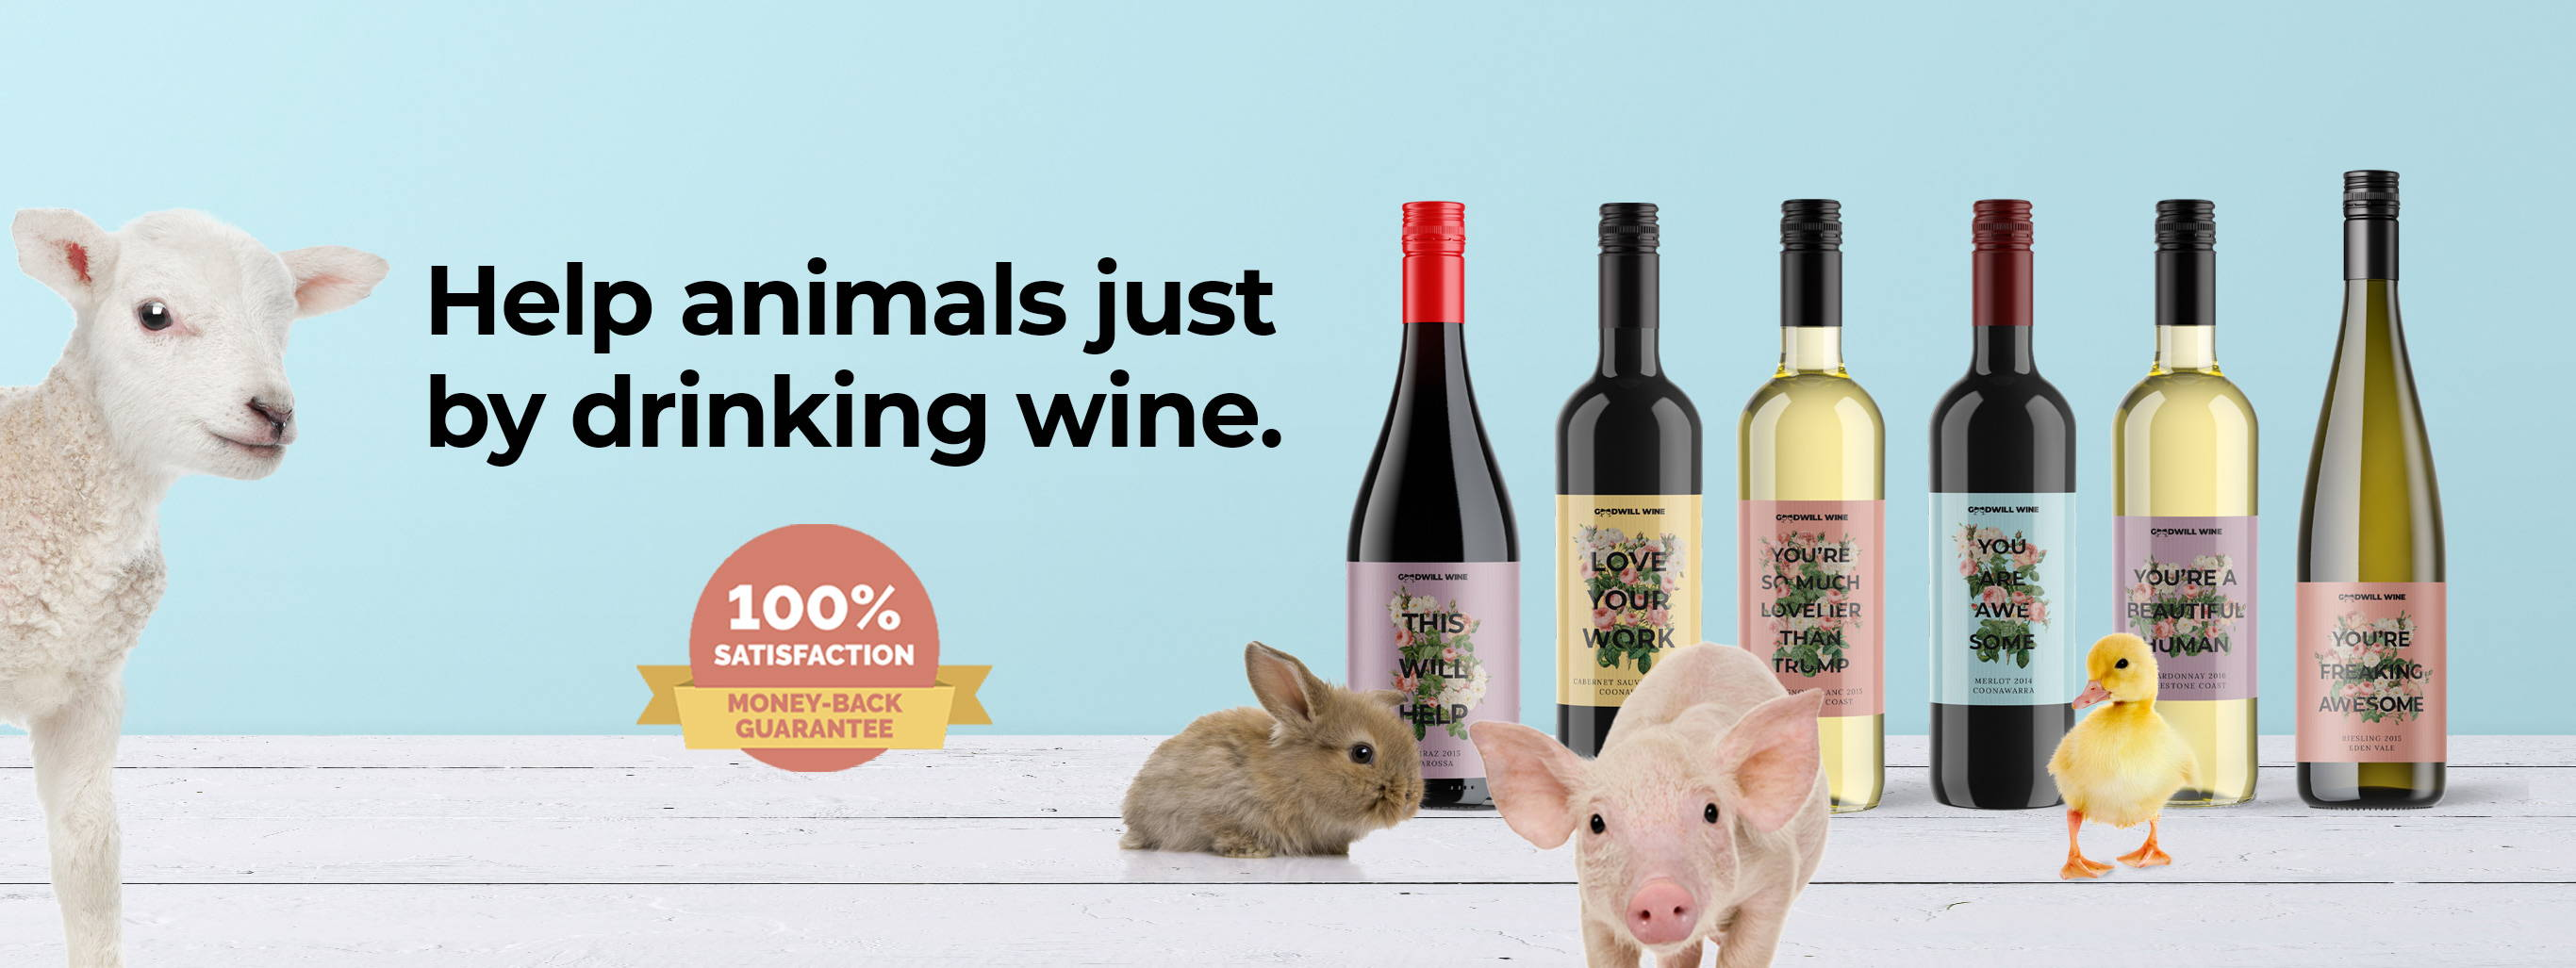 Help animals just by drinking wine.